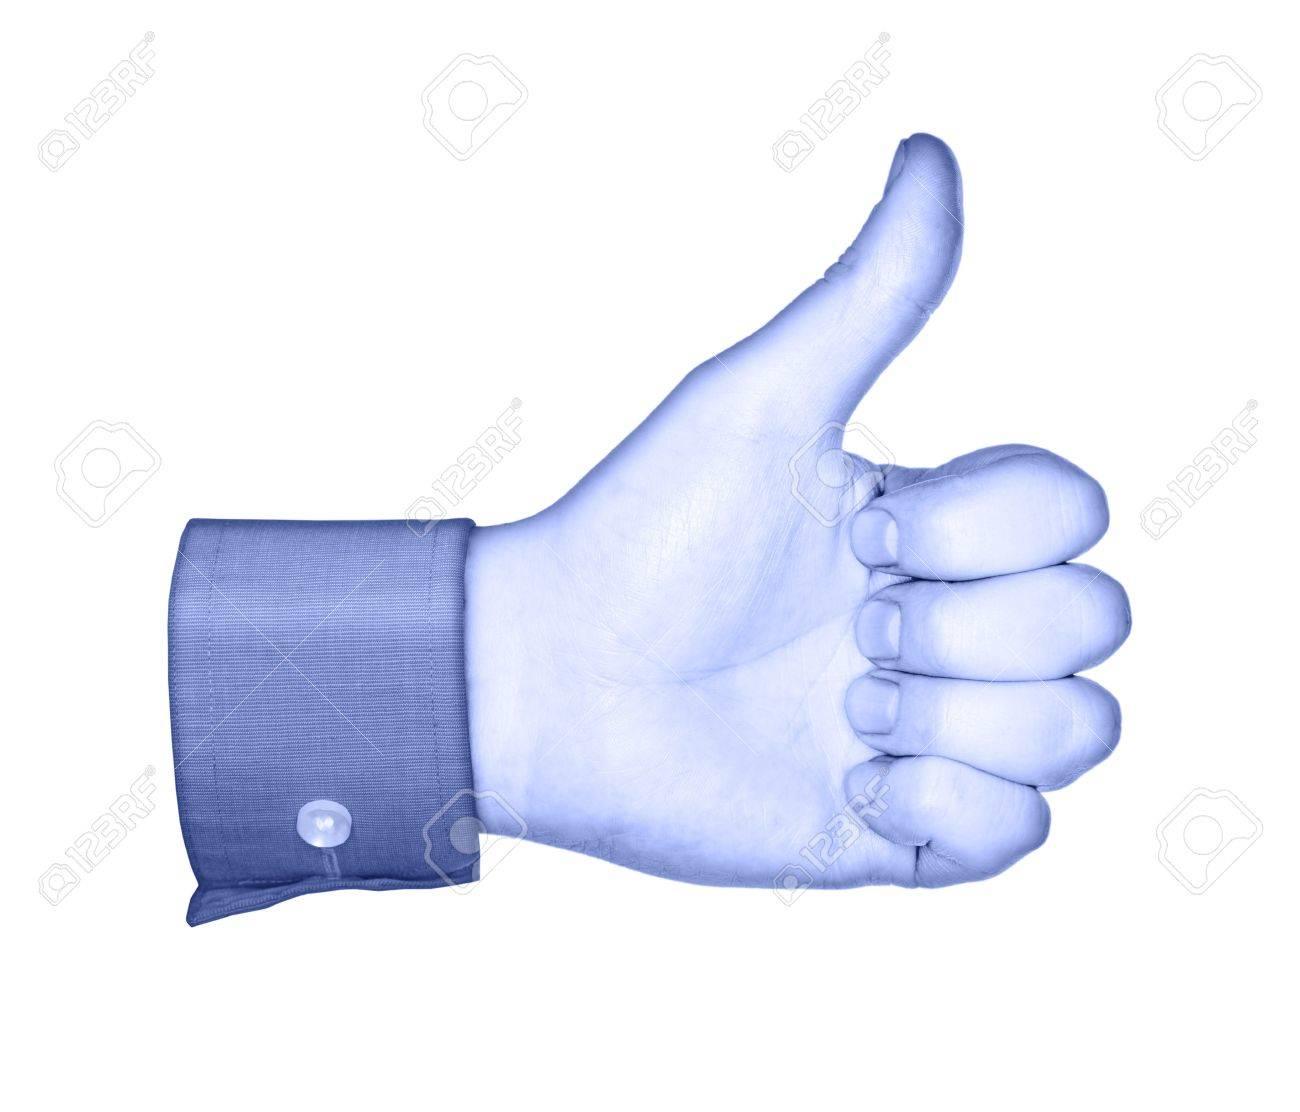 Conceptual image of a blue hand, similar to social media